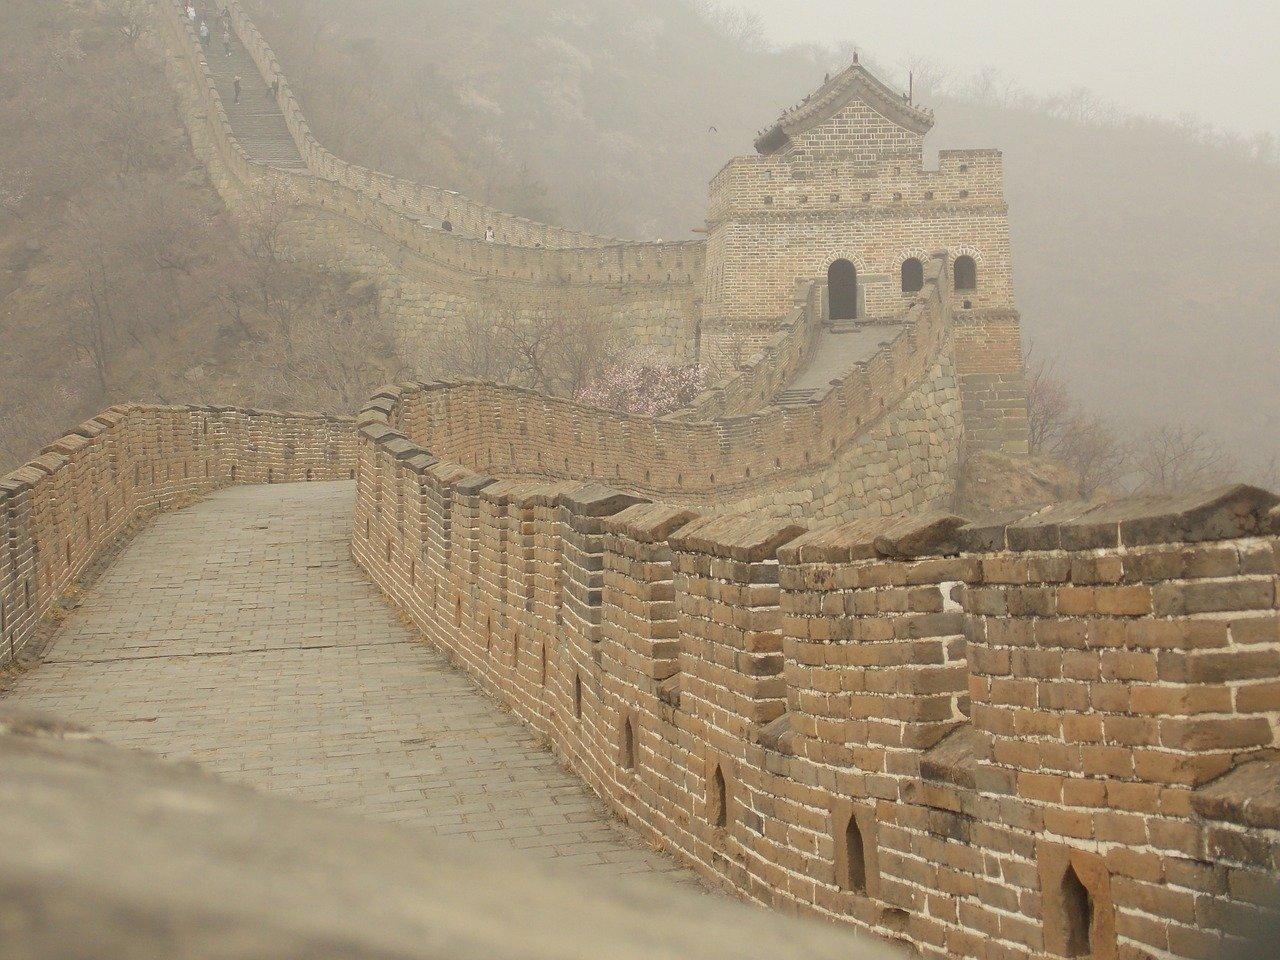 chinese muur in de mist